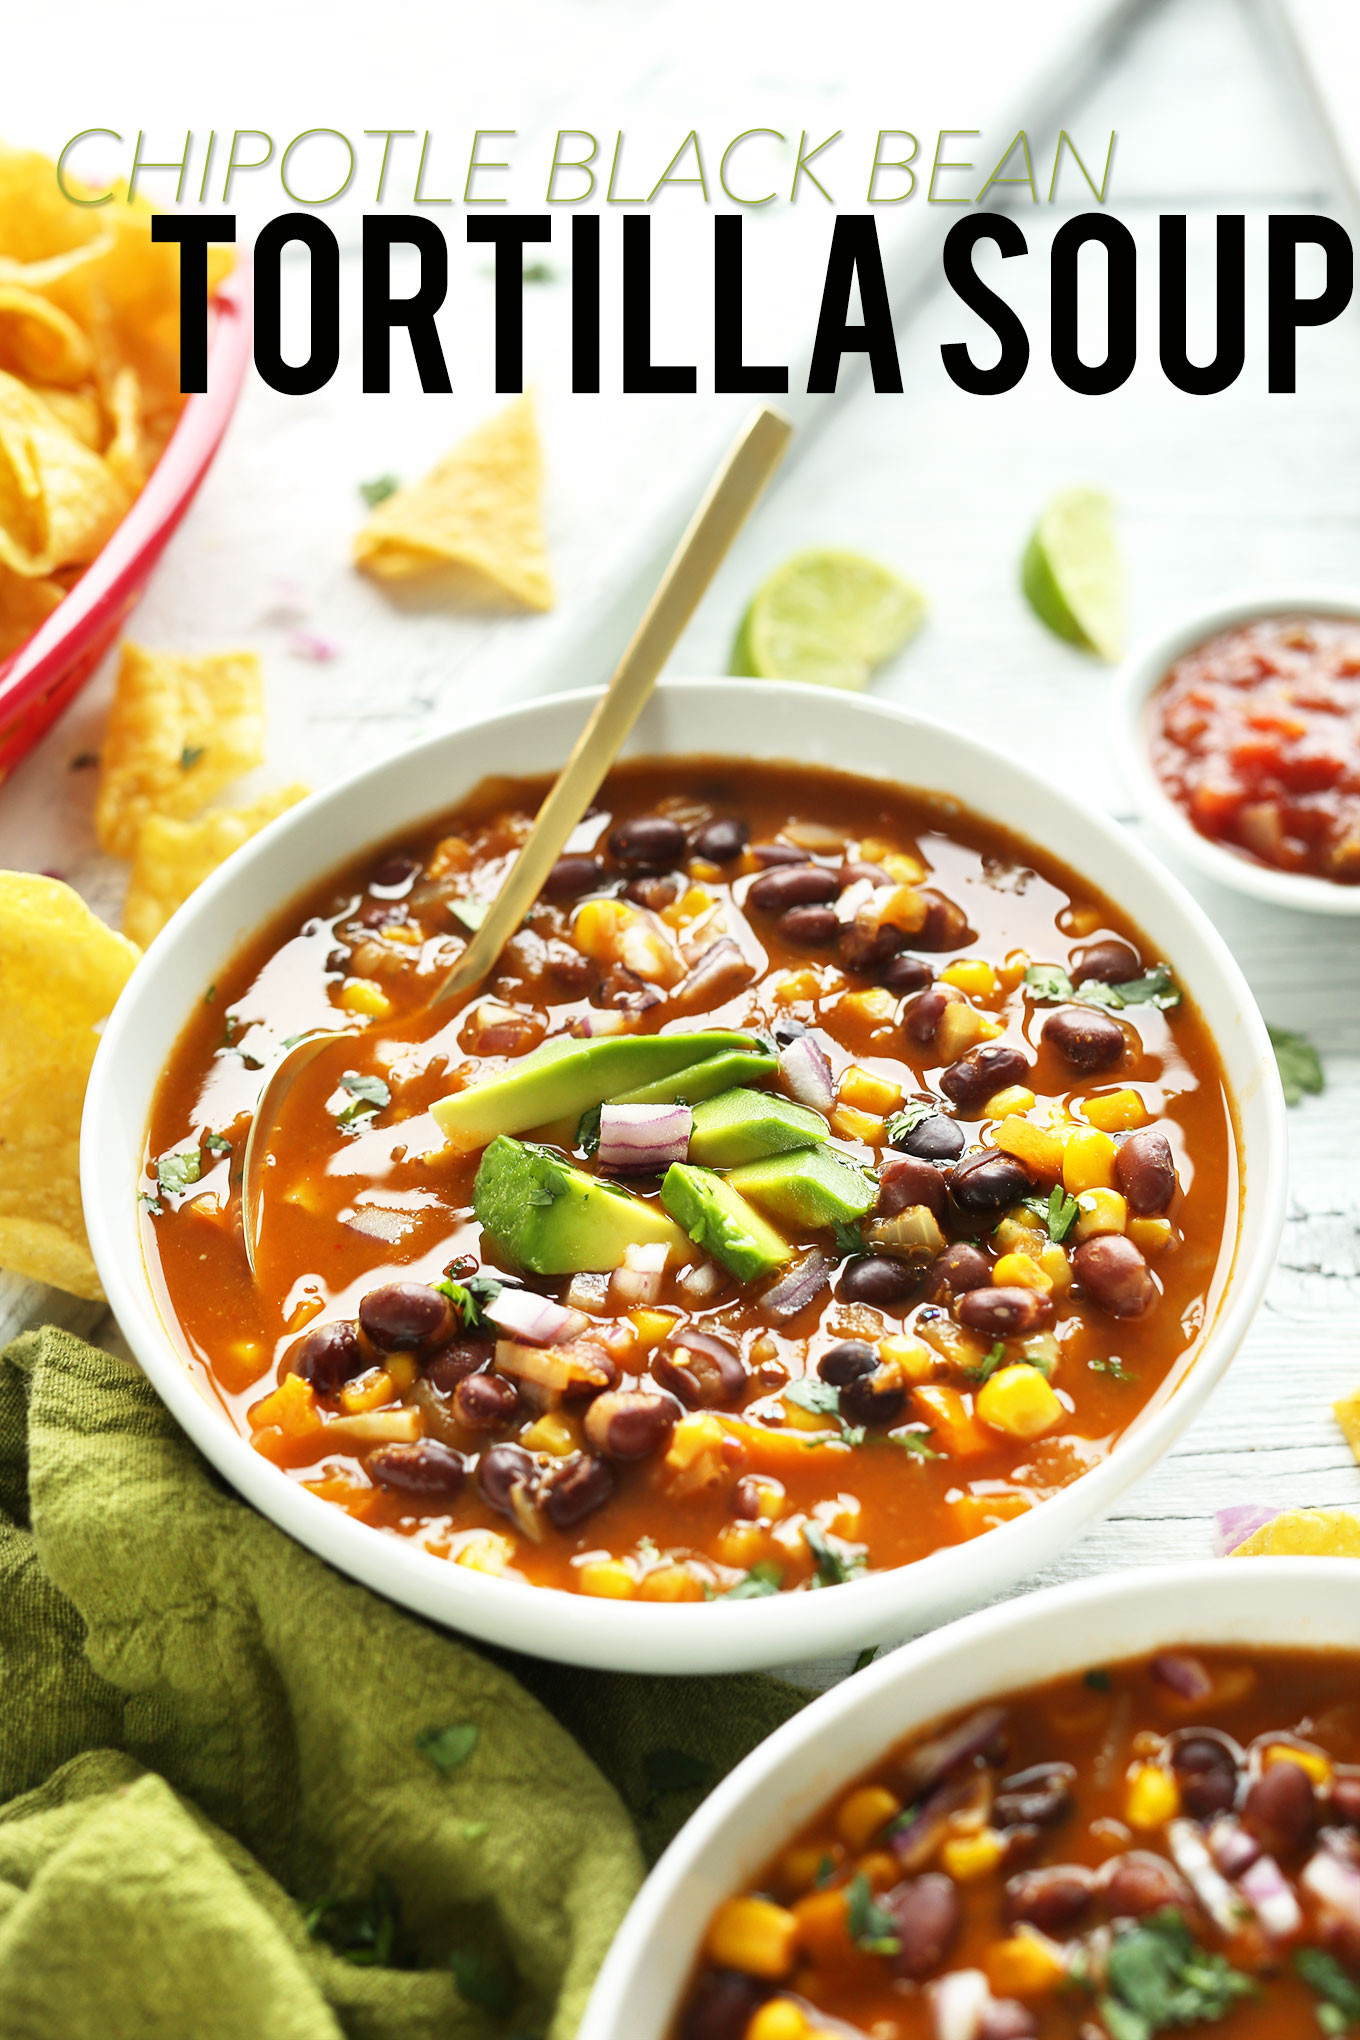 Delicious Healthy Vegan Recipes  Black Bean Tortilla Soup